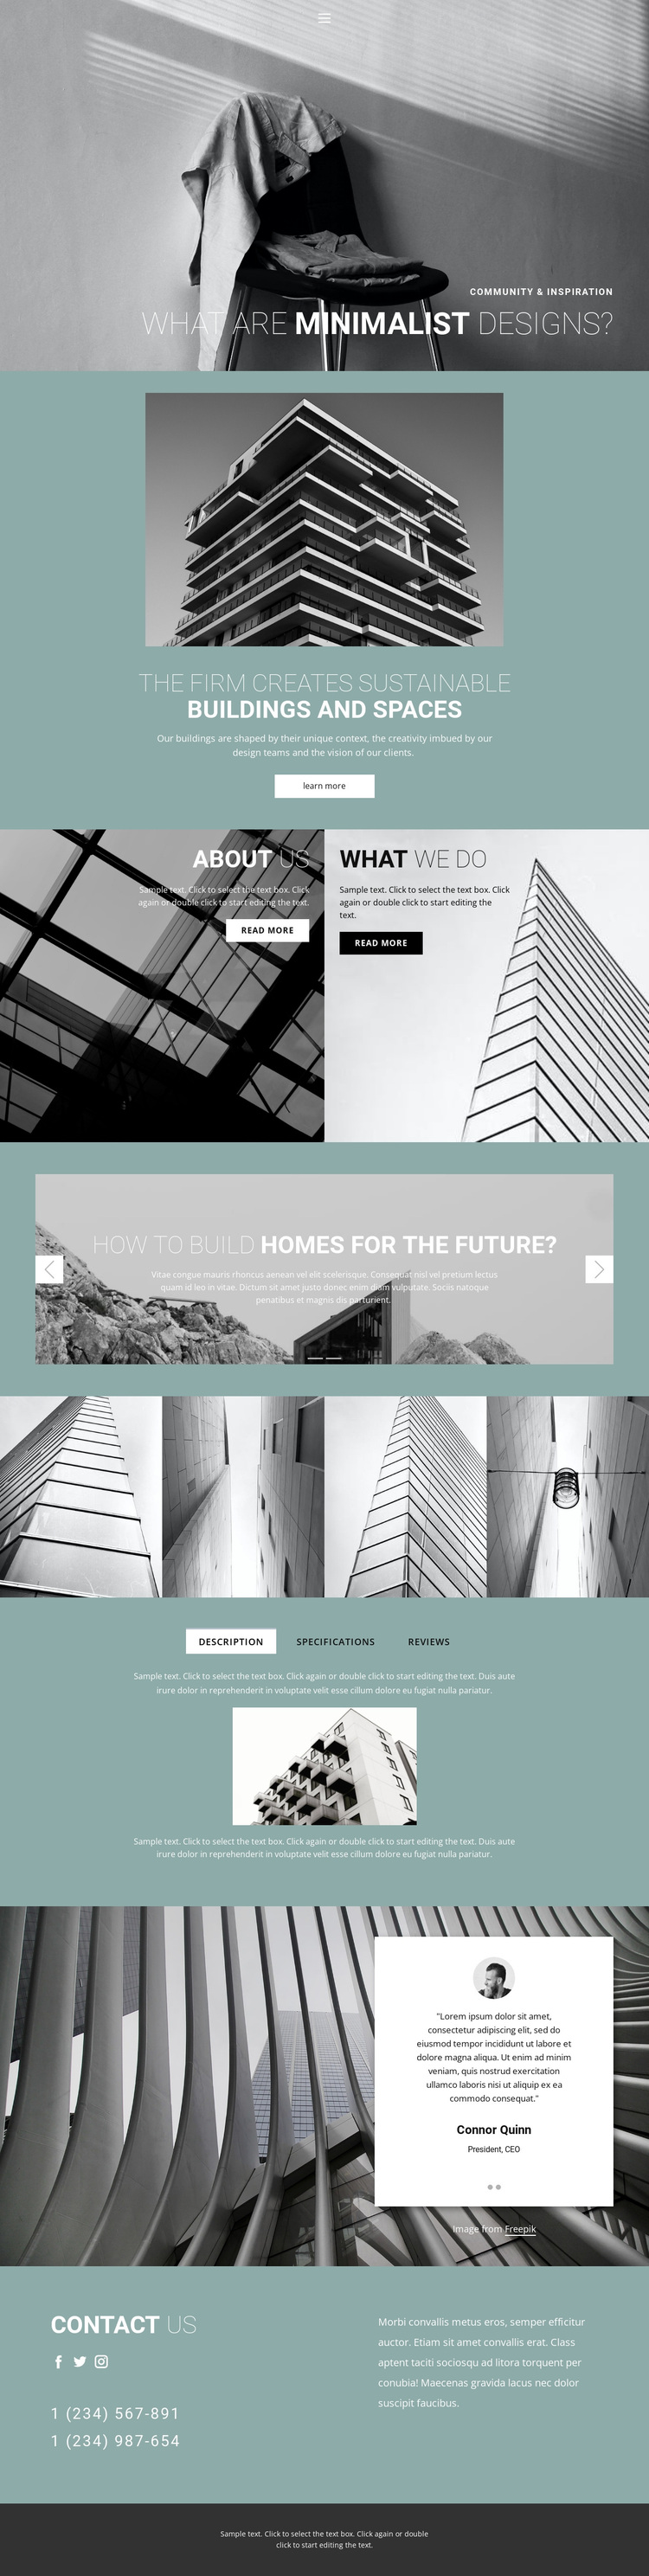 Perfect architecture ideas Joomla Page Builder